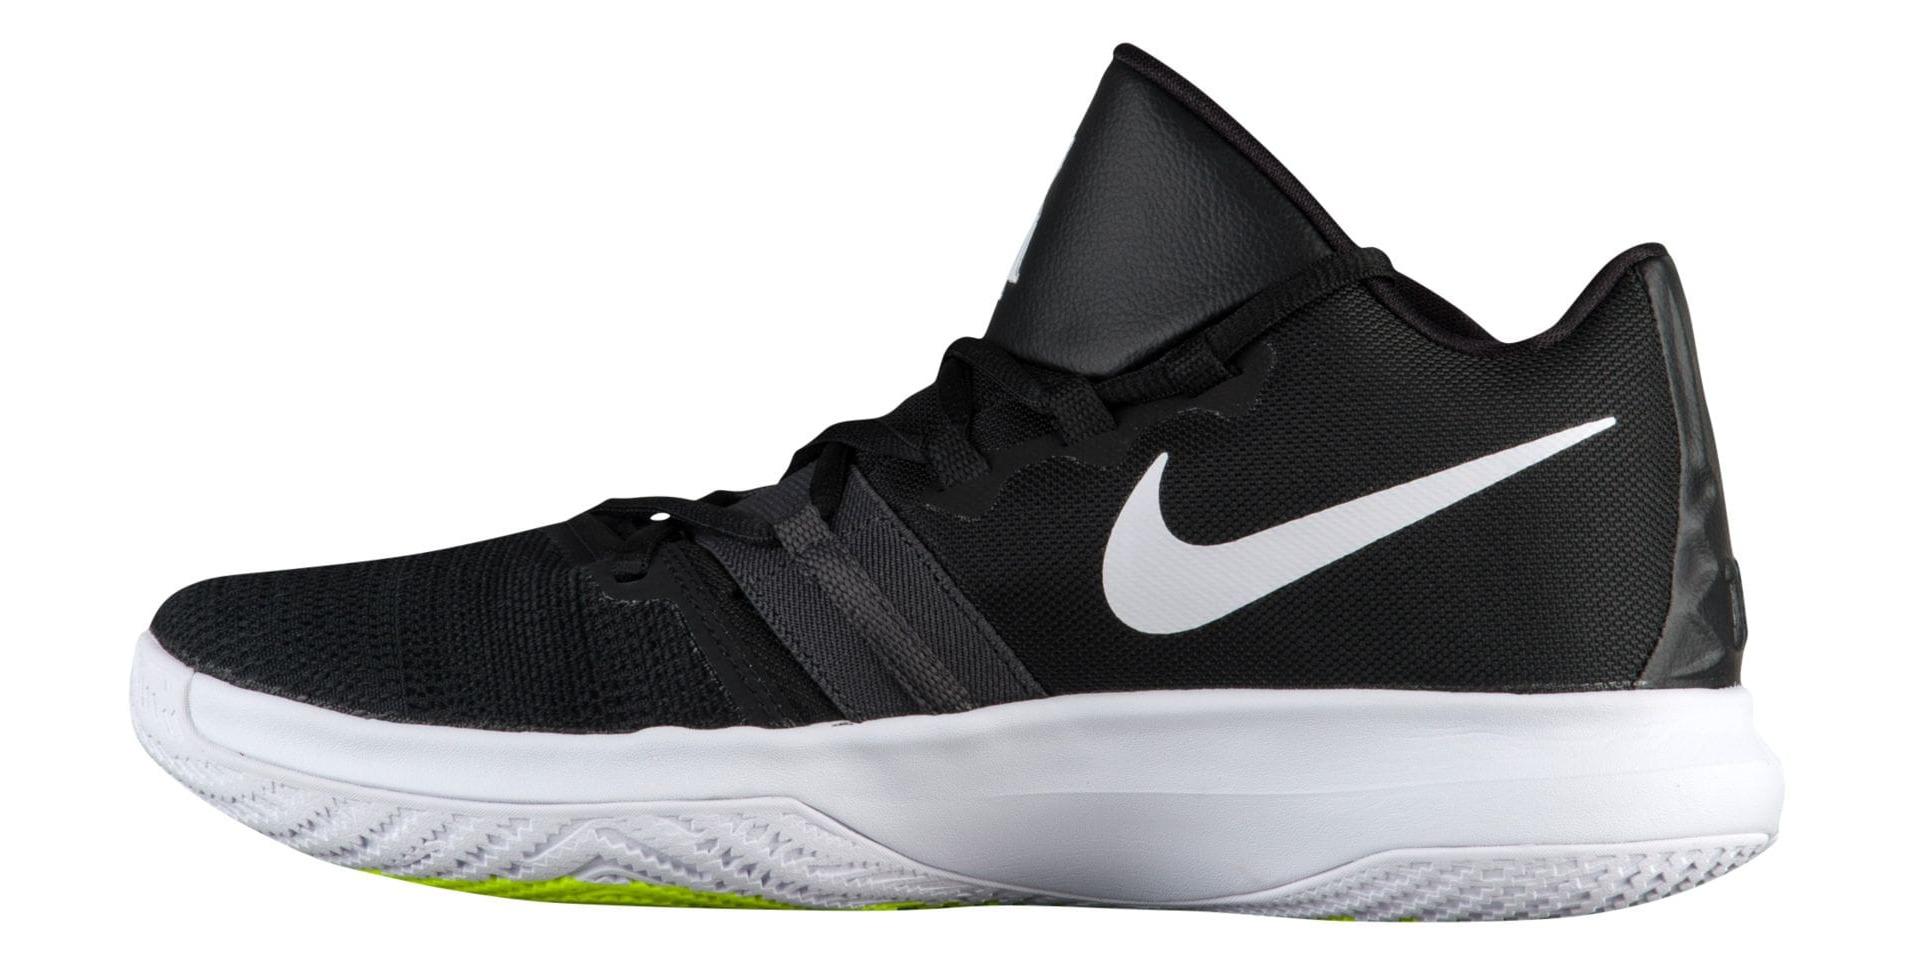 Budget Model, the Nike Kyrie Flytrap